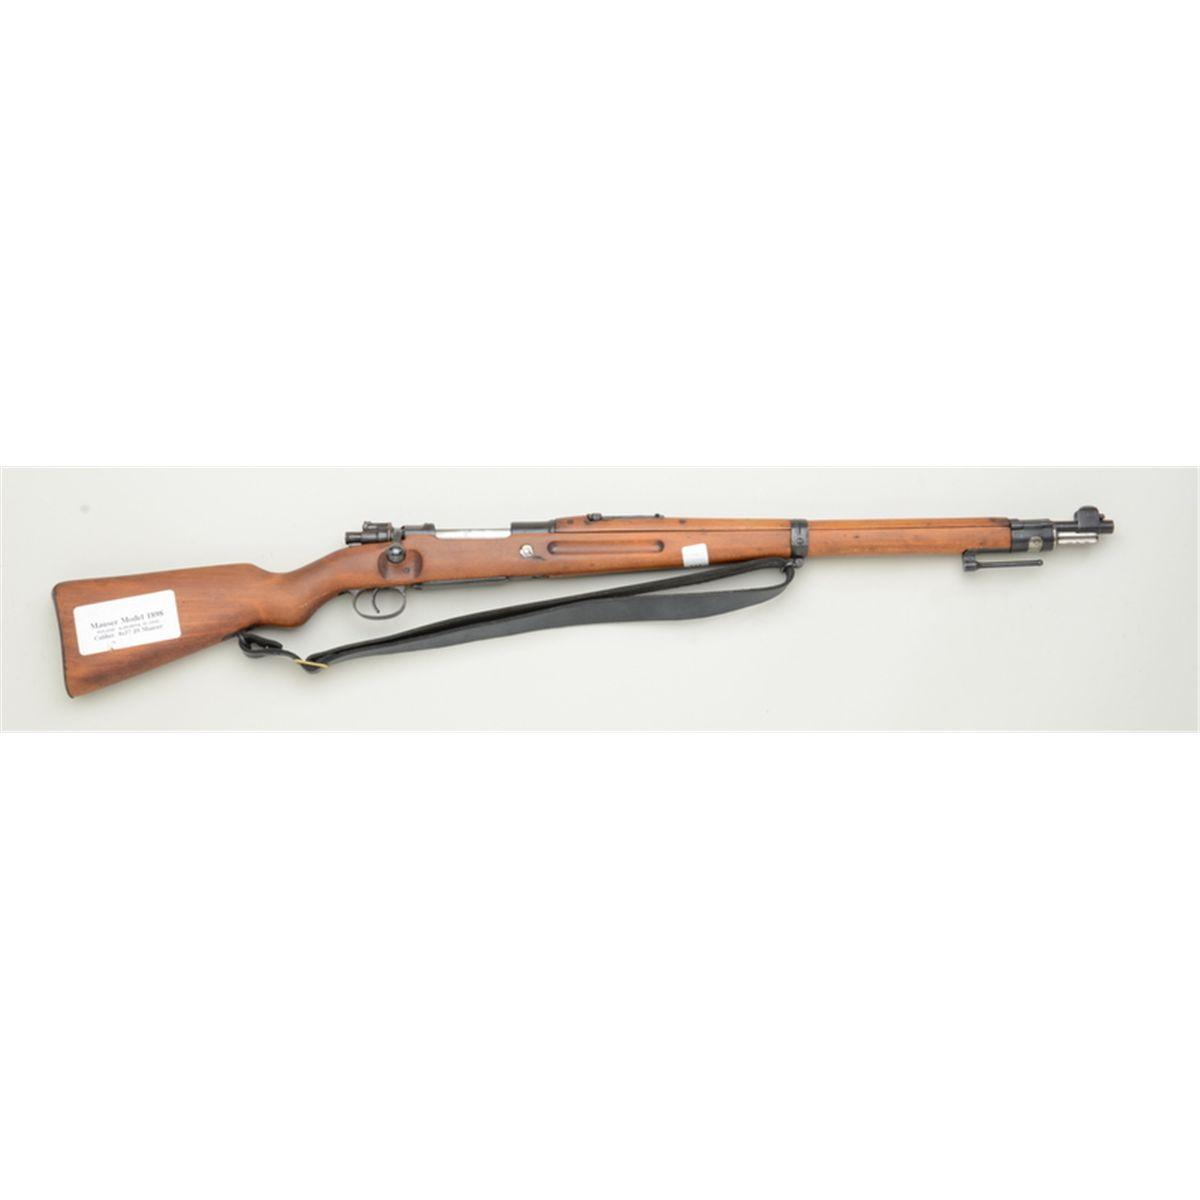 Polish Mauser Model 98 bolt-action military rifle, 8mm cal , 24